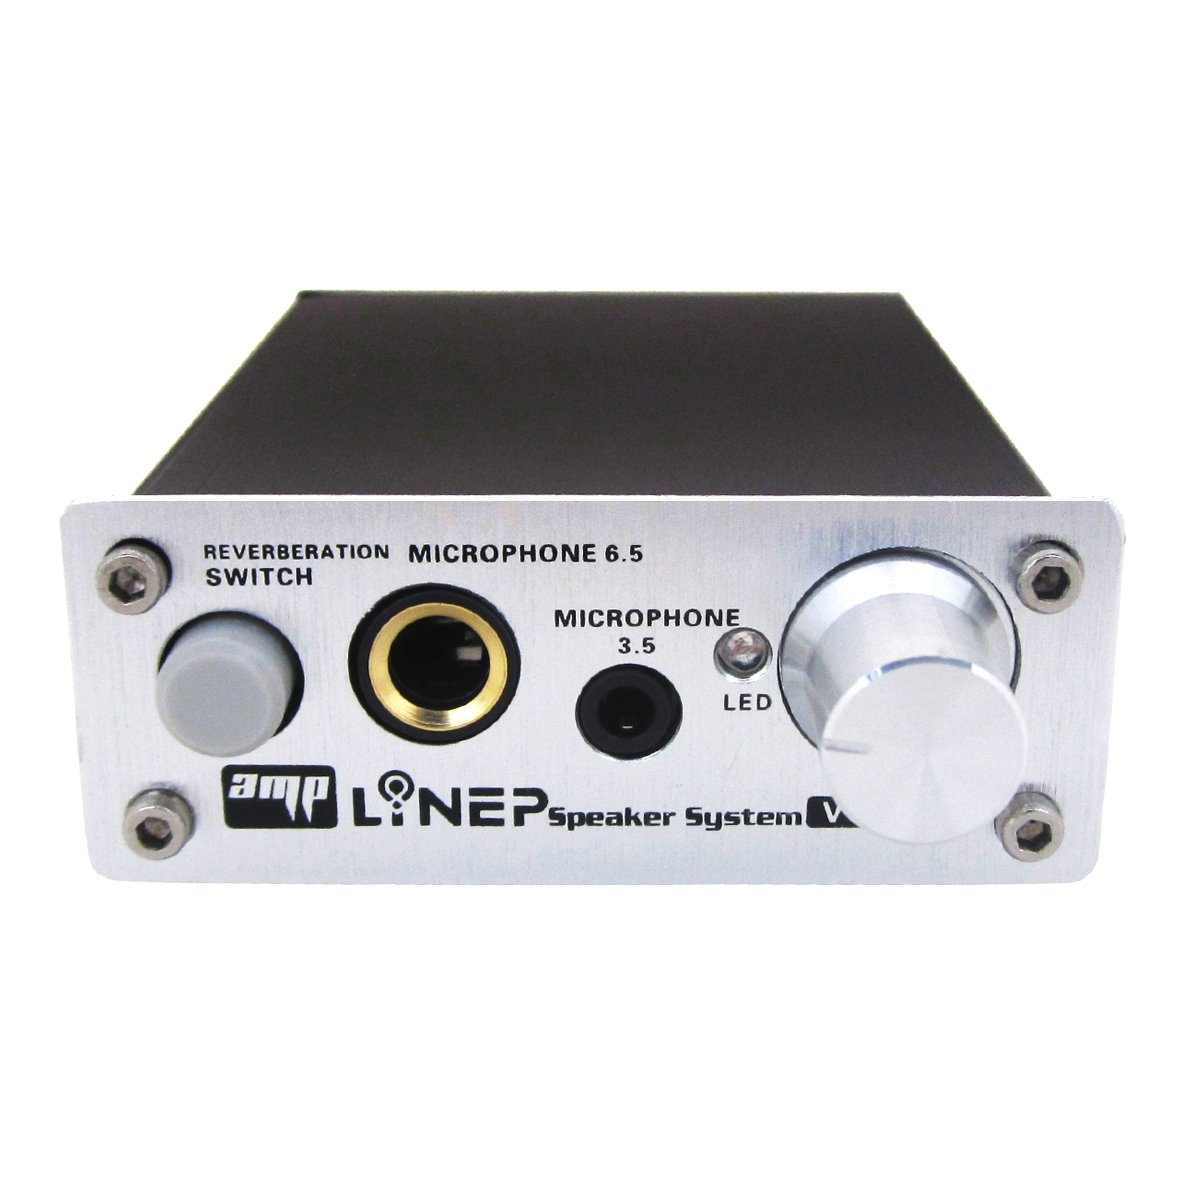 Hi Fi Stereo Sound Amplifier Meita Ultra Compact 2 Lp2020a Tripath Classt Hifi Audio Mini With Power Supply Channel Microphone Metal Speaker Amp Ampli Slot For Karaoke Mic Home